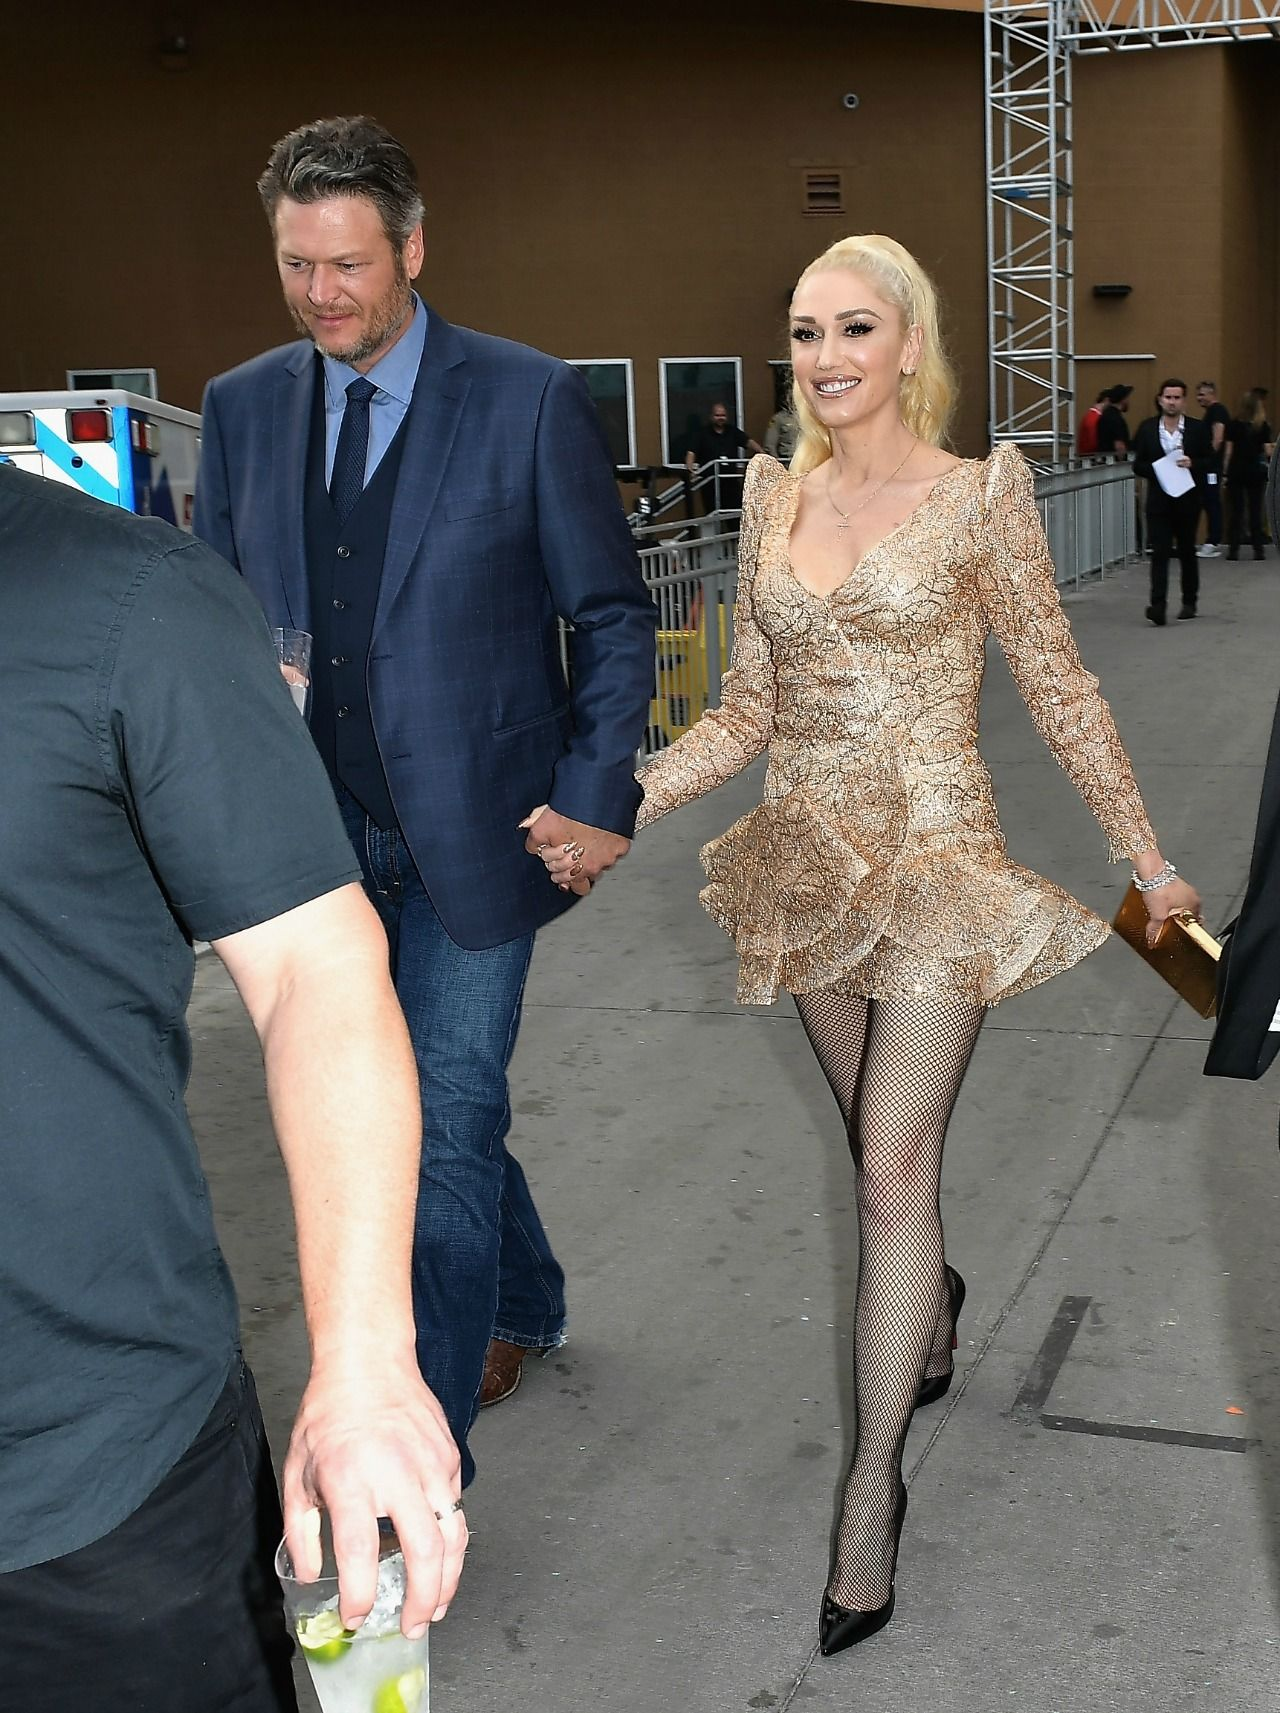 Gwen Stefani And Blake Shelton Look Adorable Together On -7702